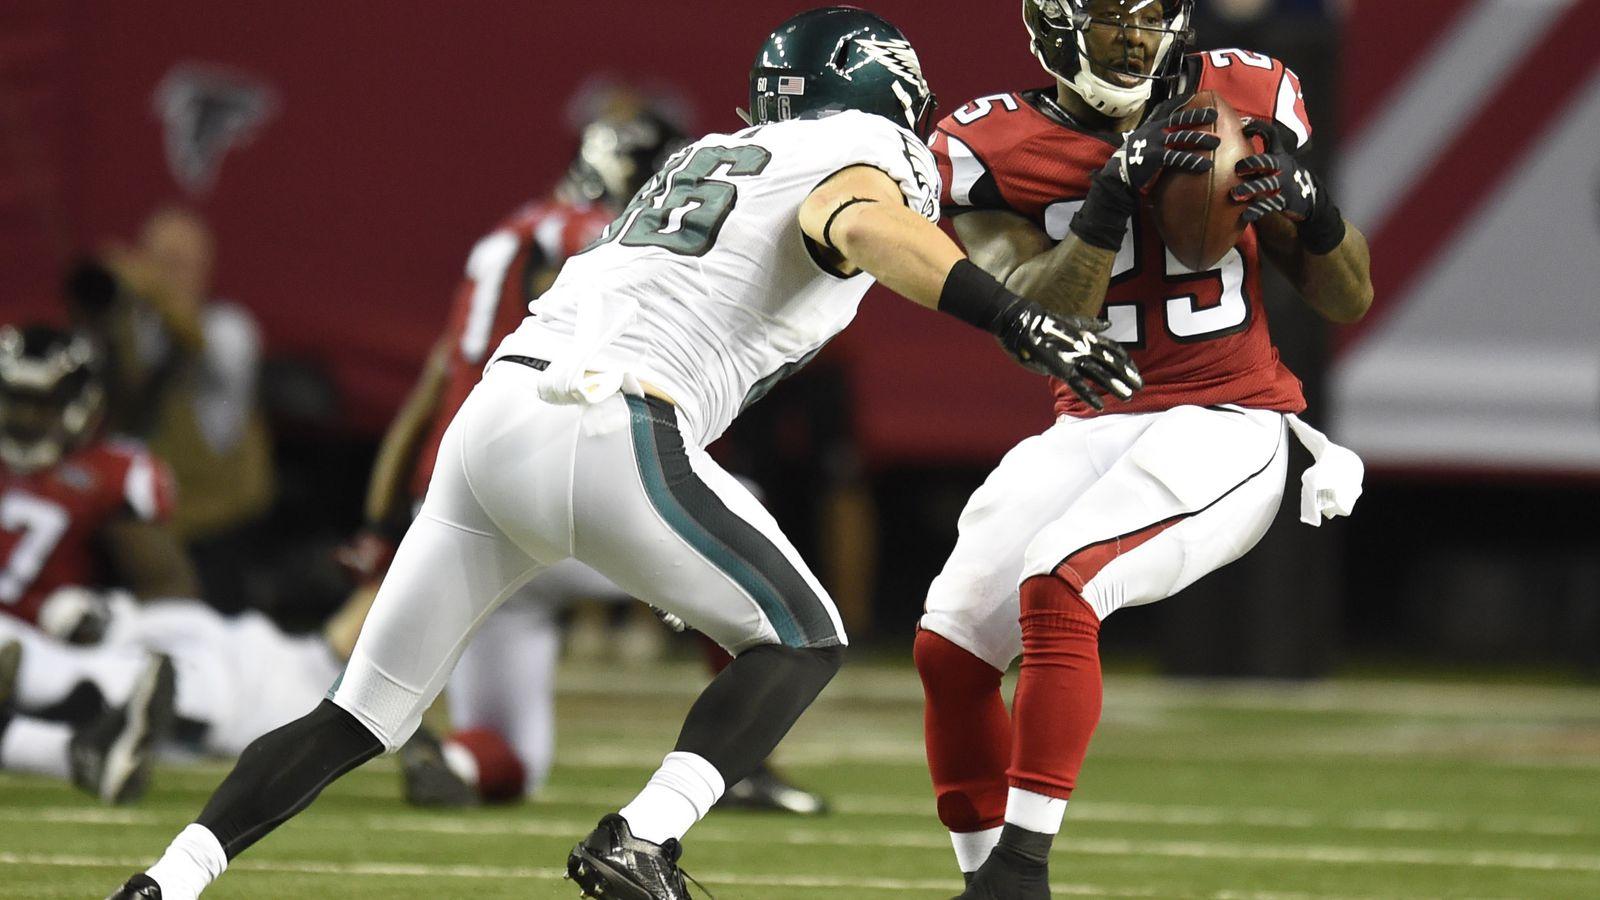 Philadelphia Eagles Week 1 snap counts: Zach Ertz nearly doubled Brent Celek's playing time